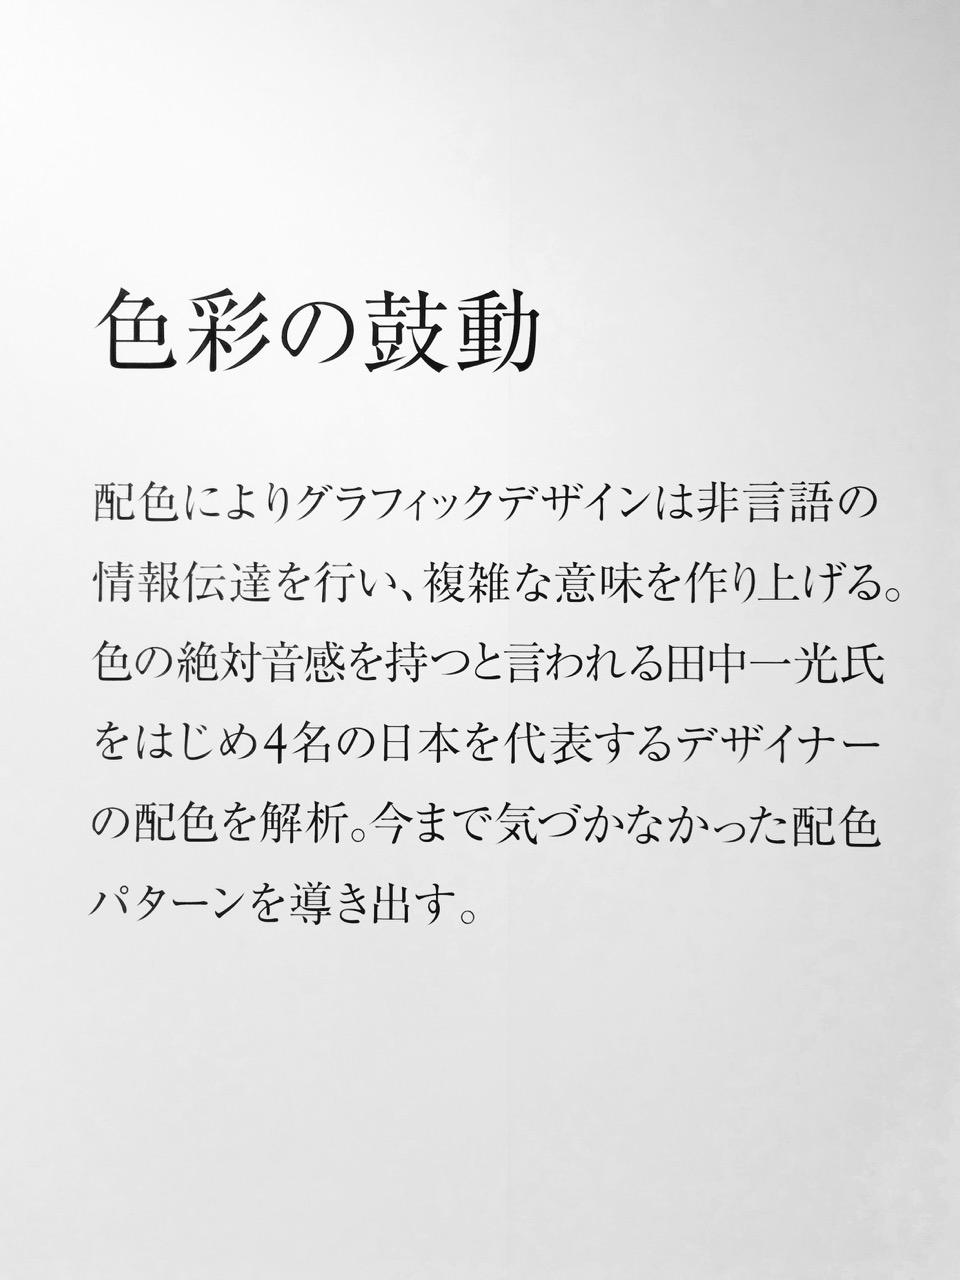 Img_2139_2